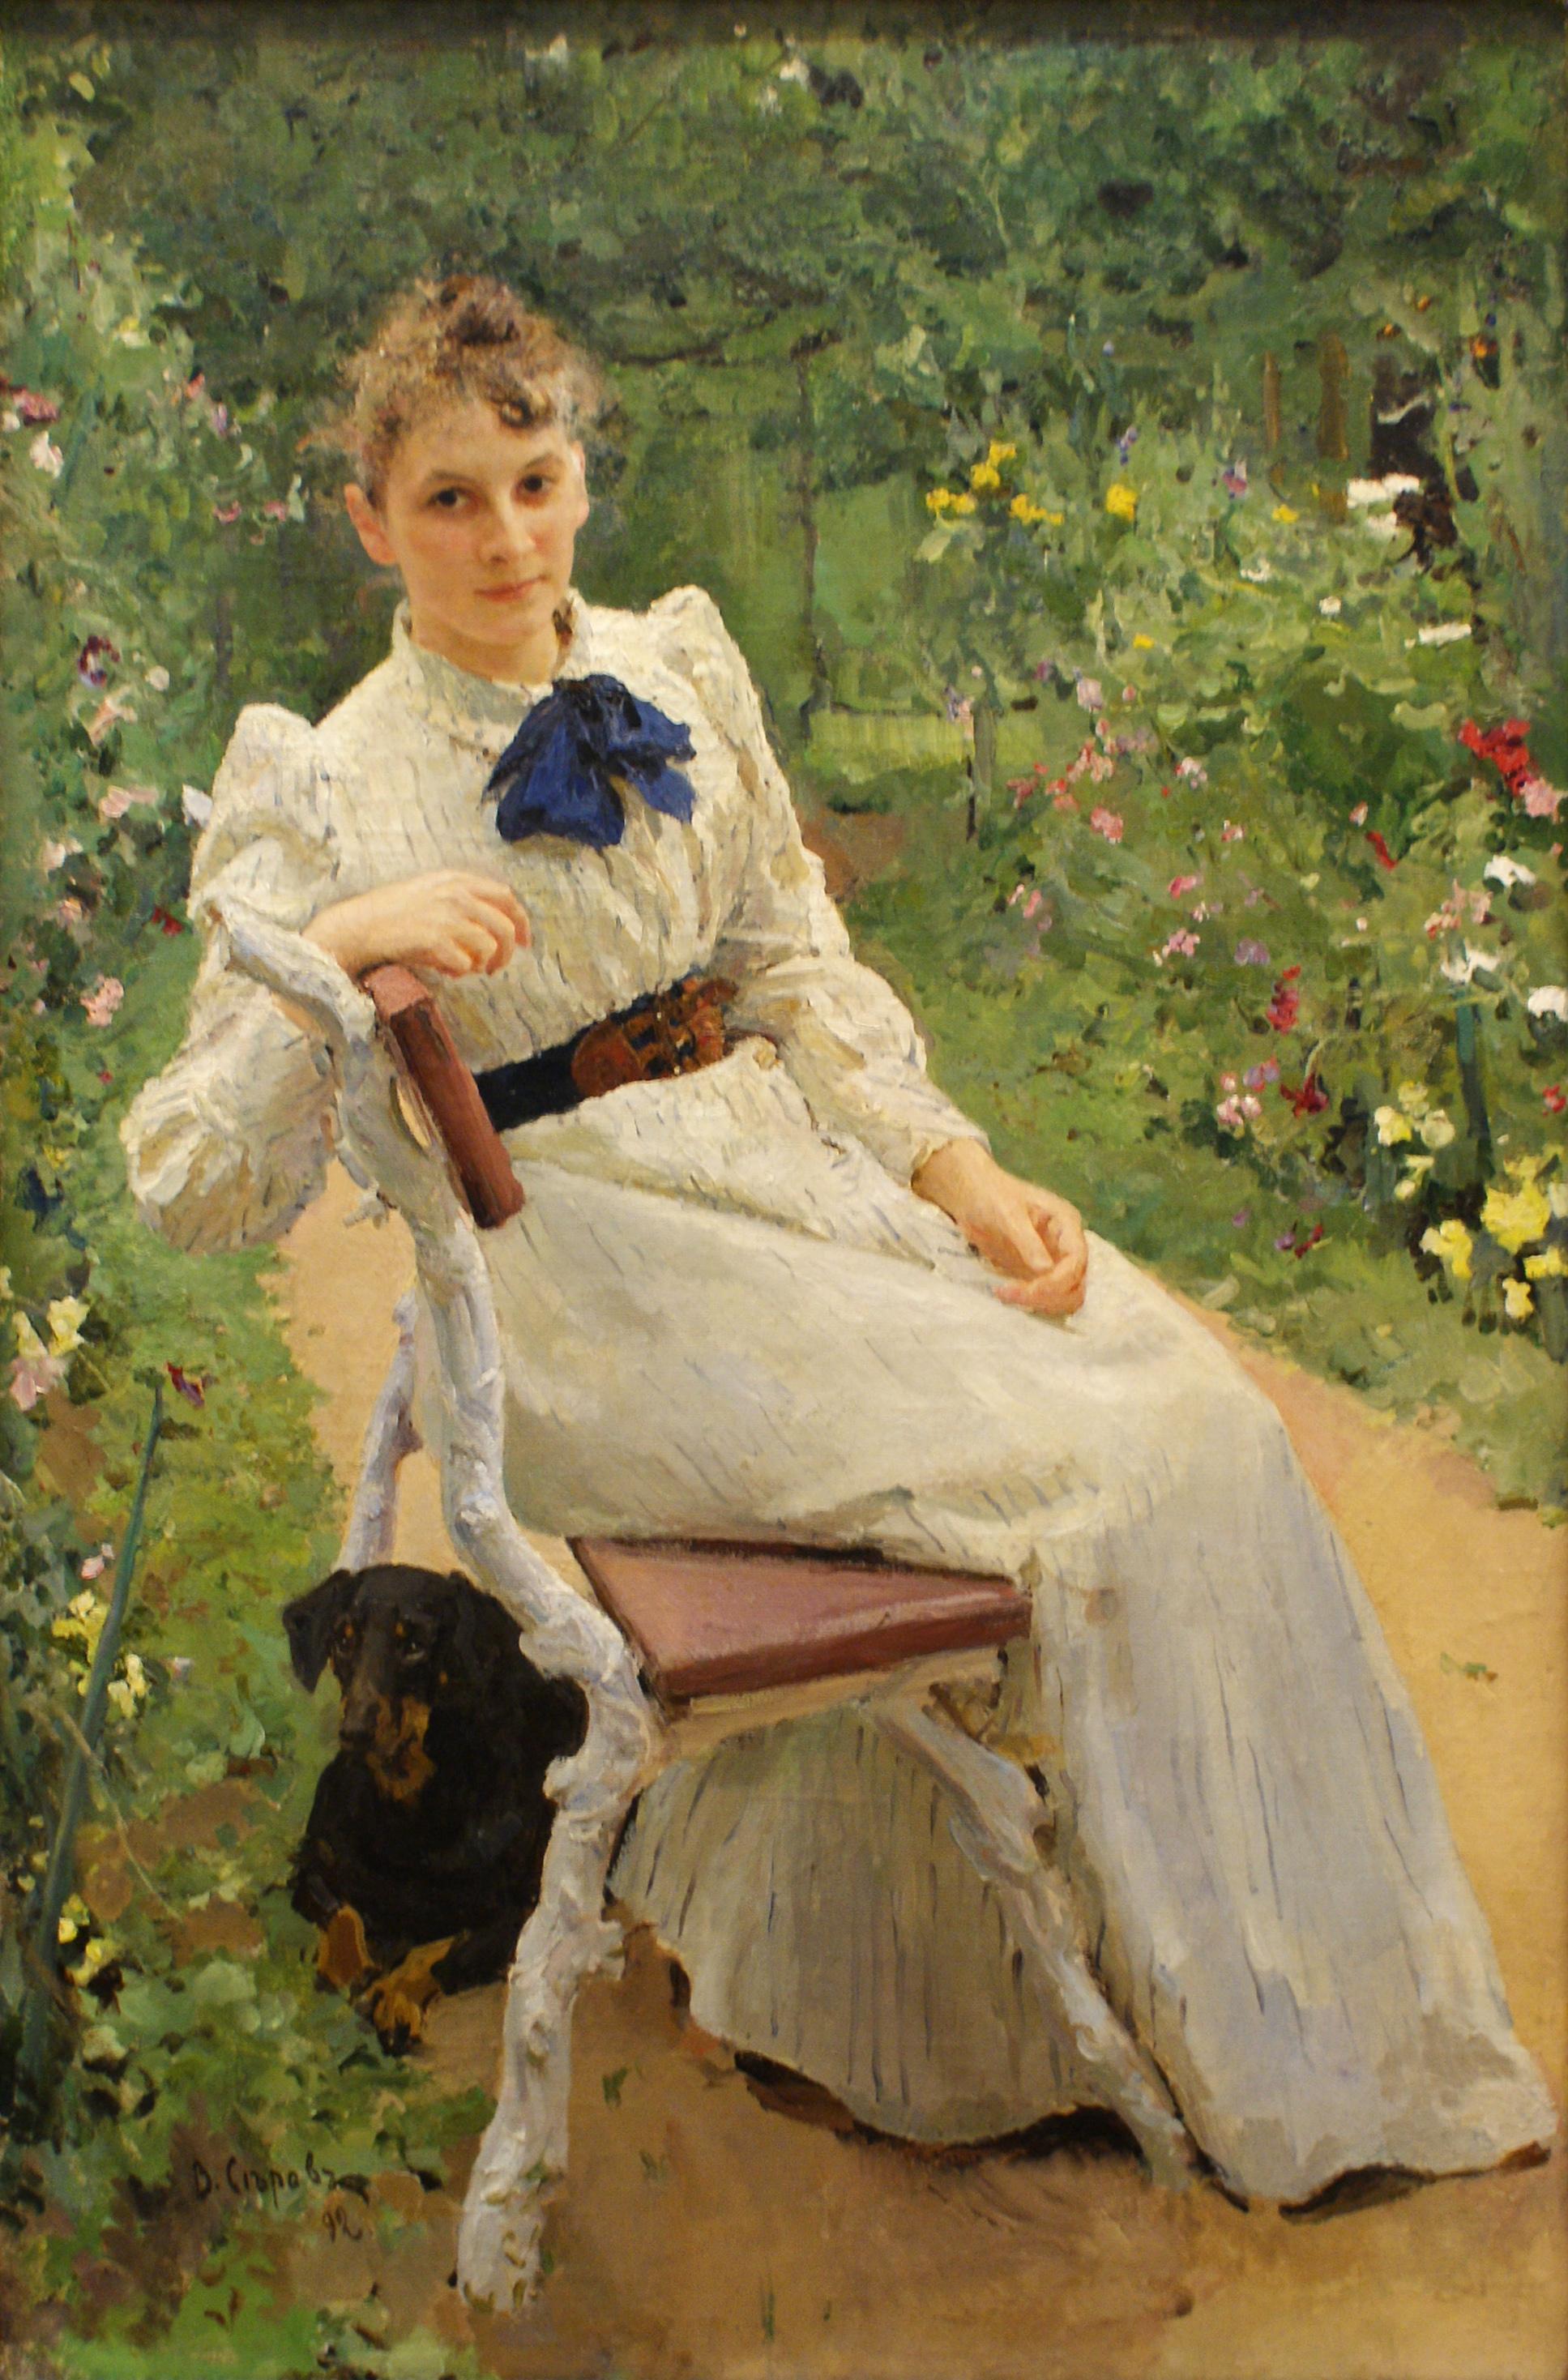 File:Olga Fedorovna Tamara by V.Serov (1892).jpg - Wikimedia Commons